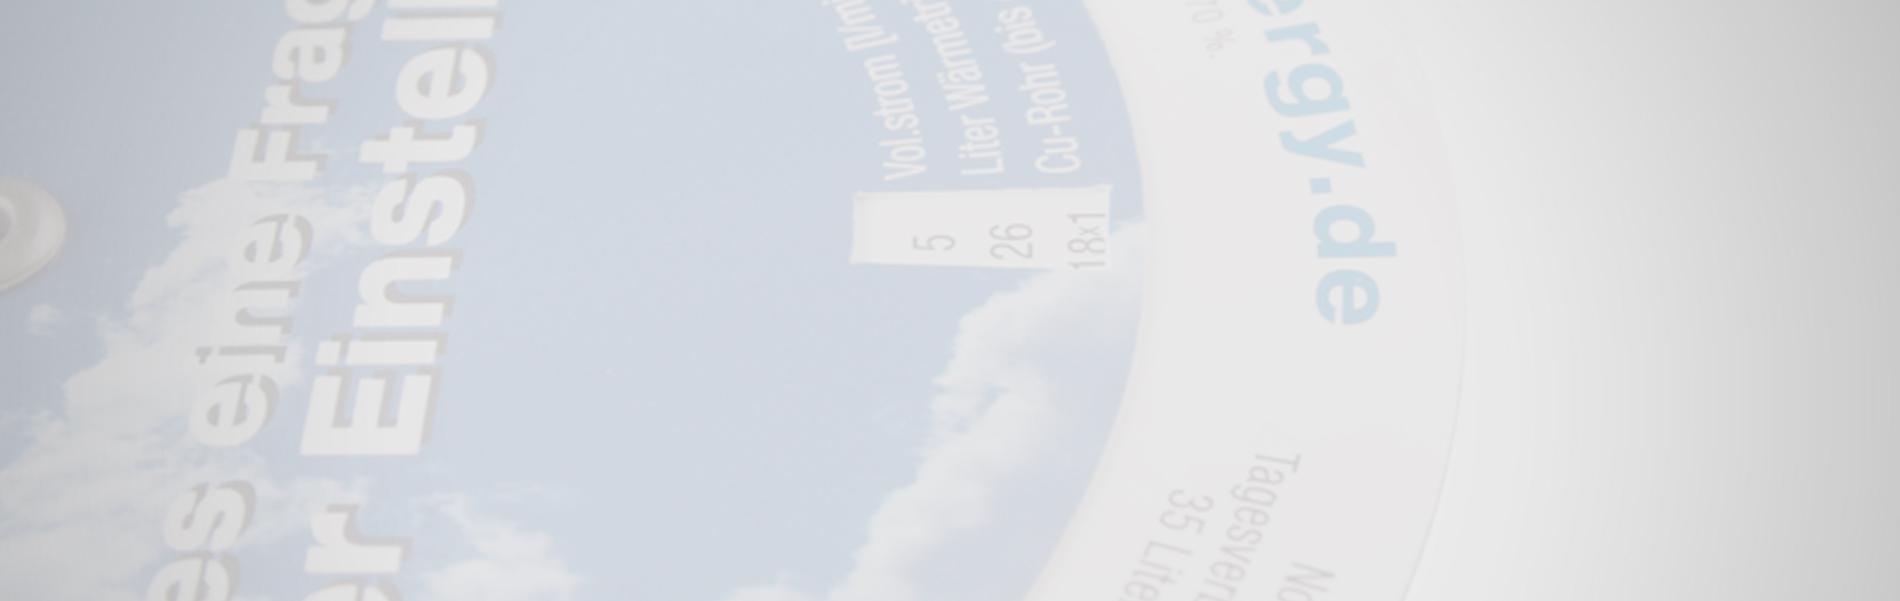 Slider_Background_13b